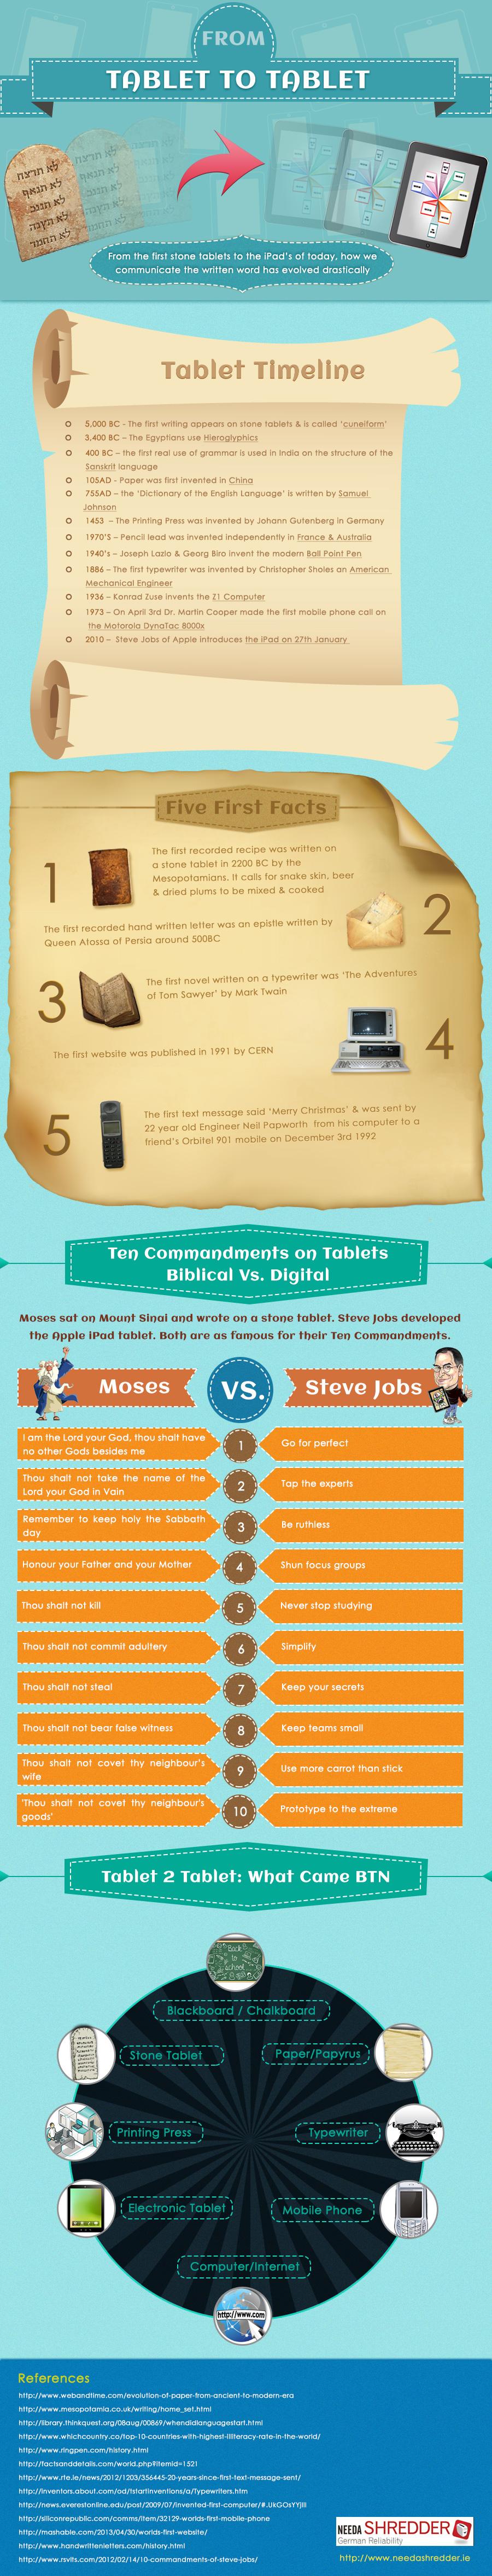 Stone Tablet vs digital tablet